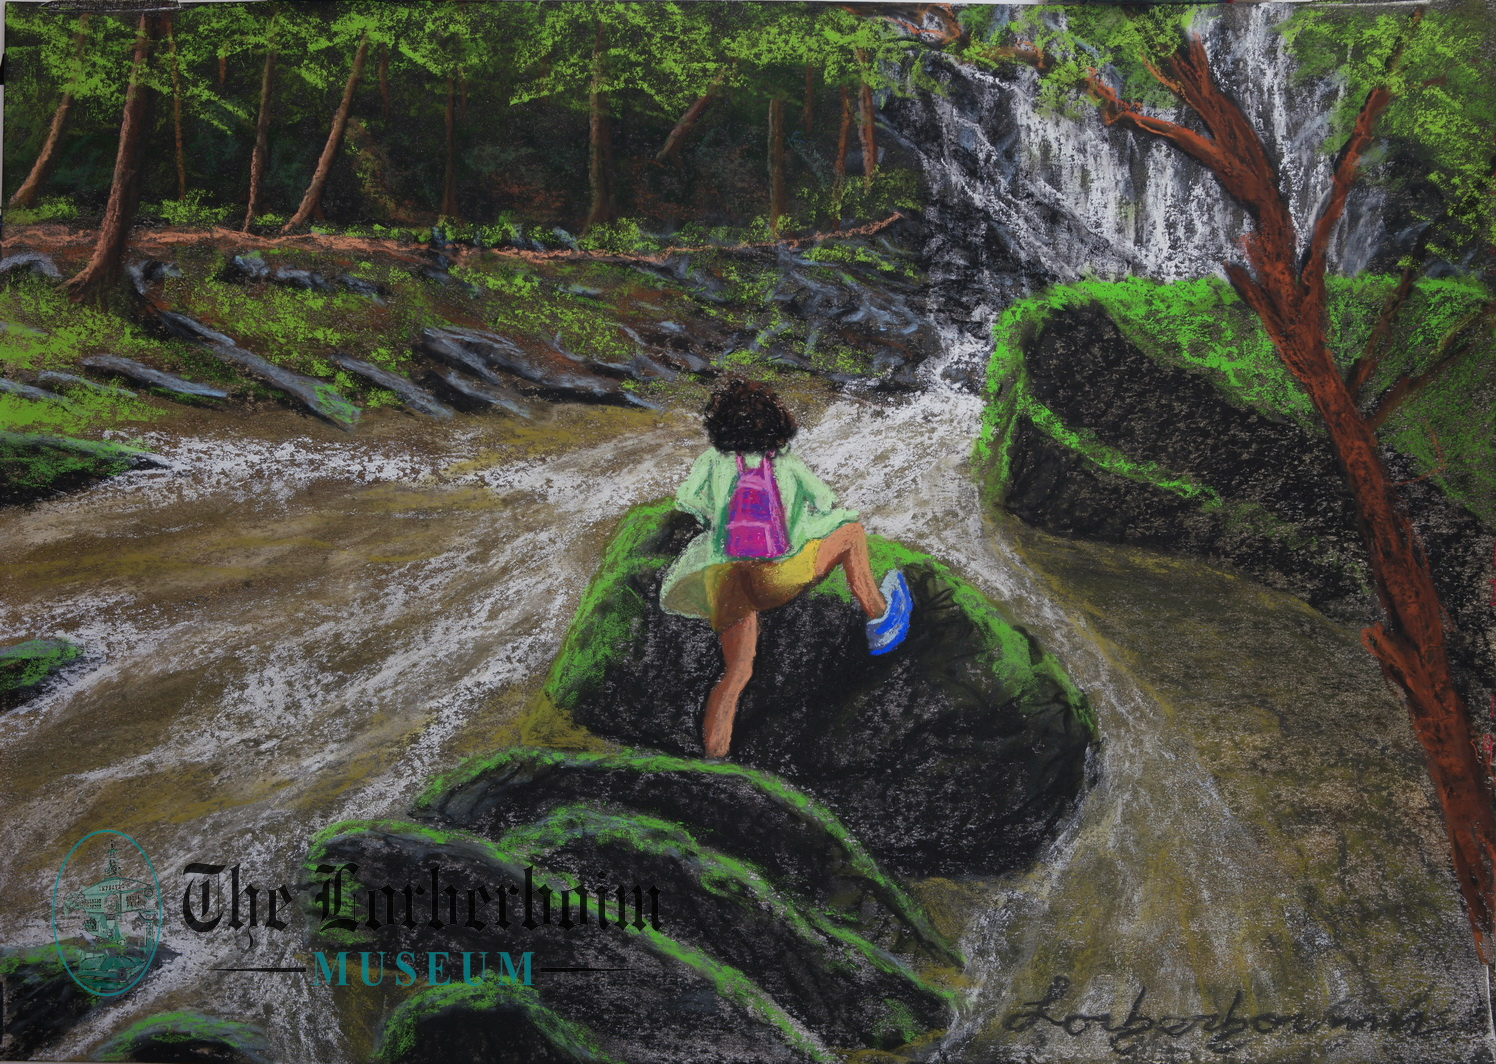 Lek climbs on rock in river, Museum, Lorberboim, Tlmuseum.com, artnot4sale, Lorberboim.com, Lorberboim Soft Pastel Painting,